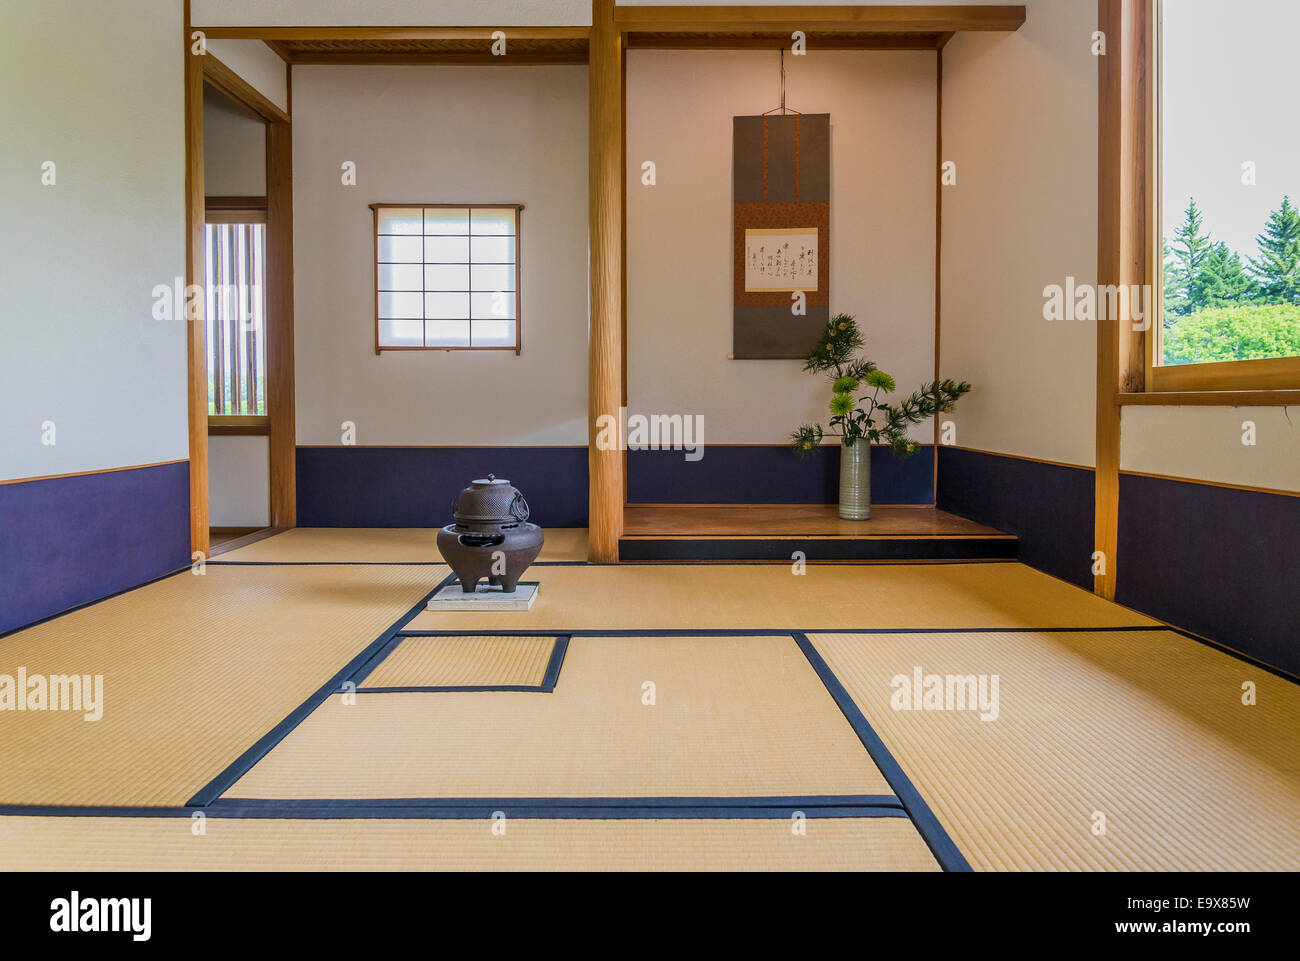 Salon japonais jardin japonais nikka yuko lethbridge alberta photo stock